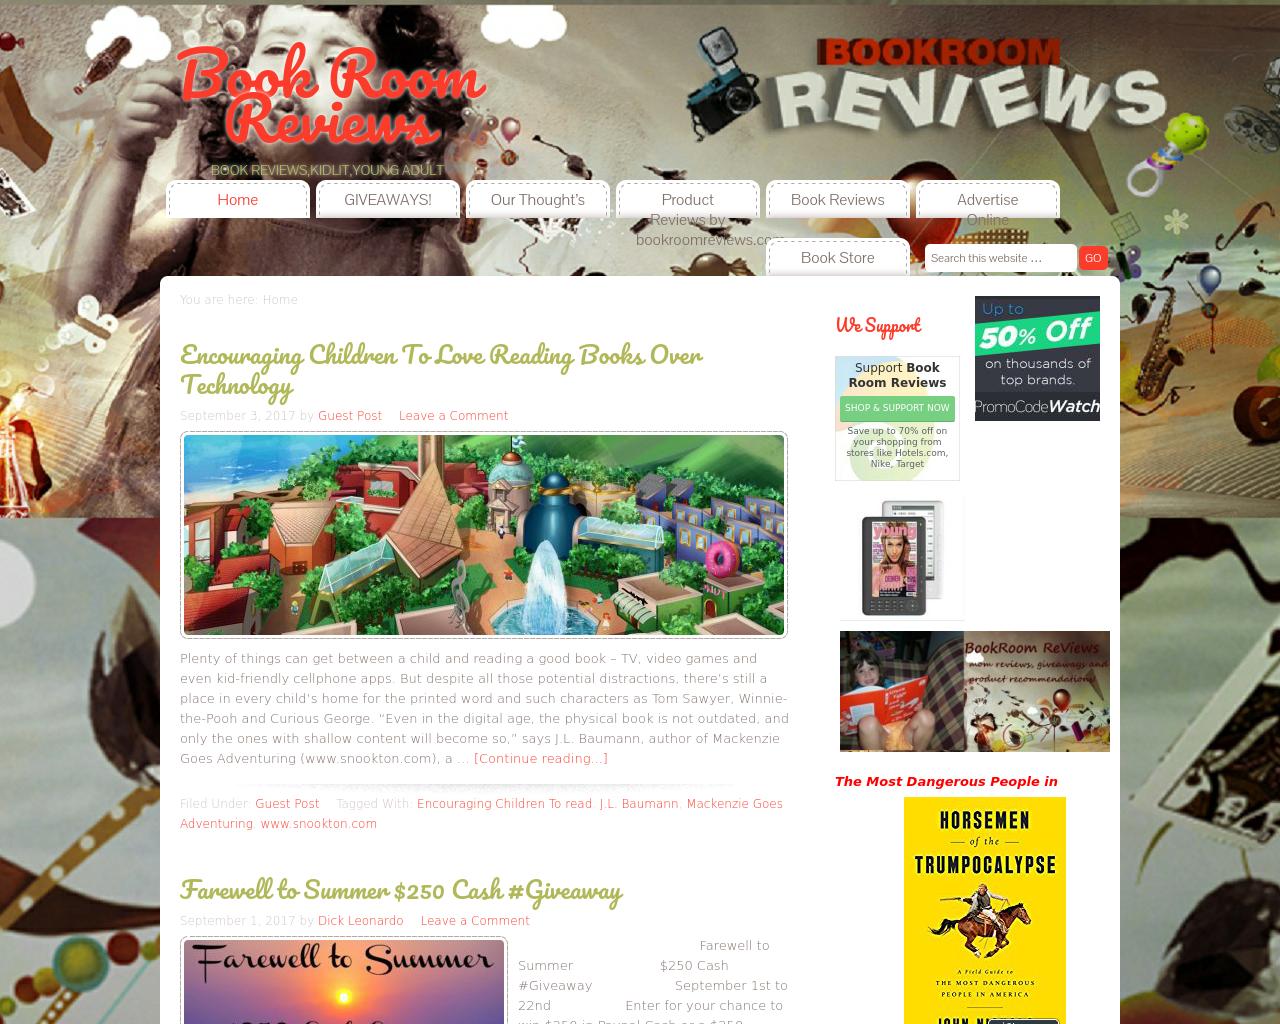 Bookroom-Reviews-Advertising-Reviews-Pricing